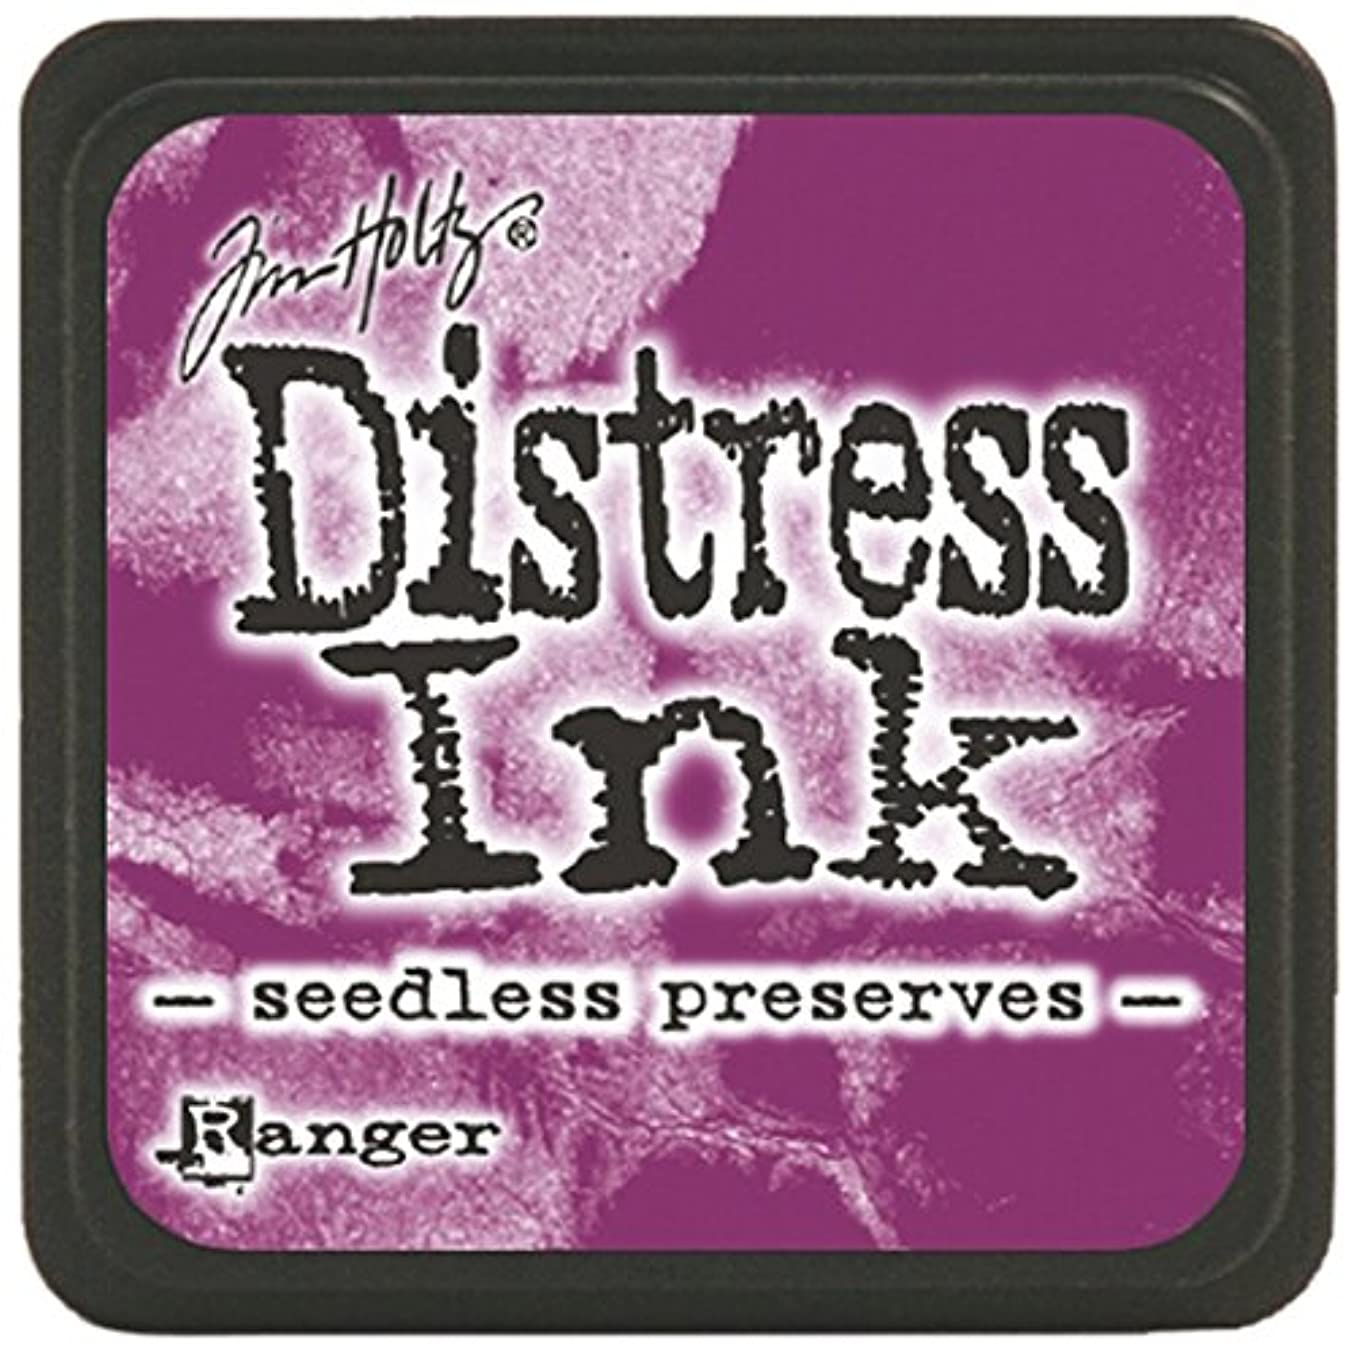 Ranger Tim Holtz Distress Ink Pads, Mini, Seedless Preserves